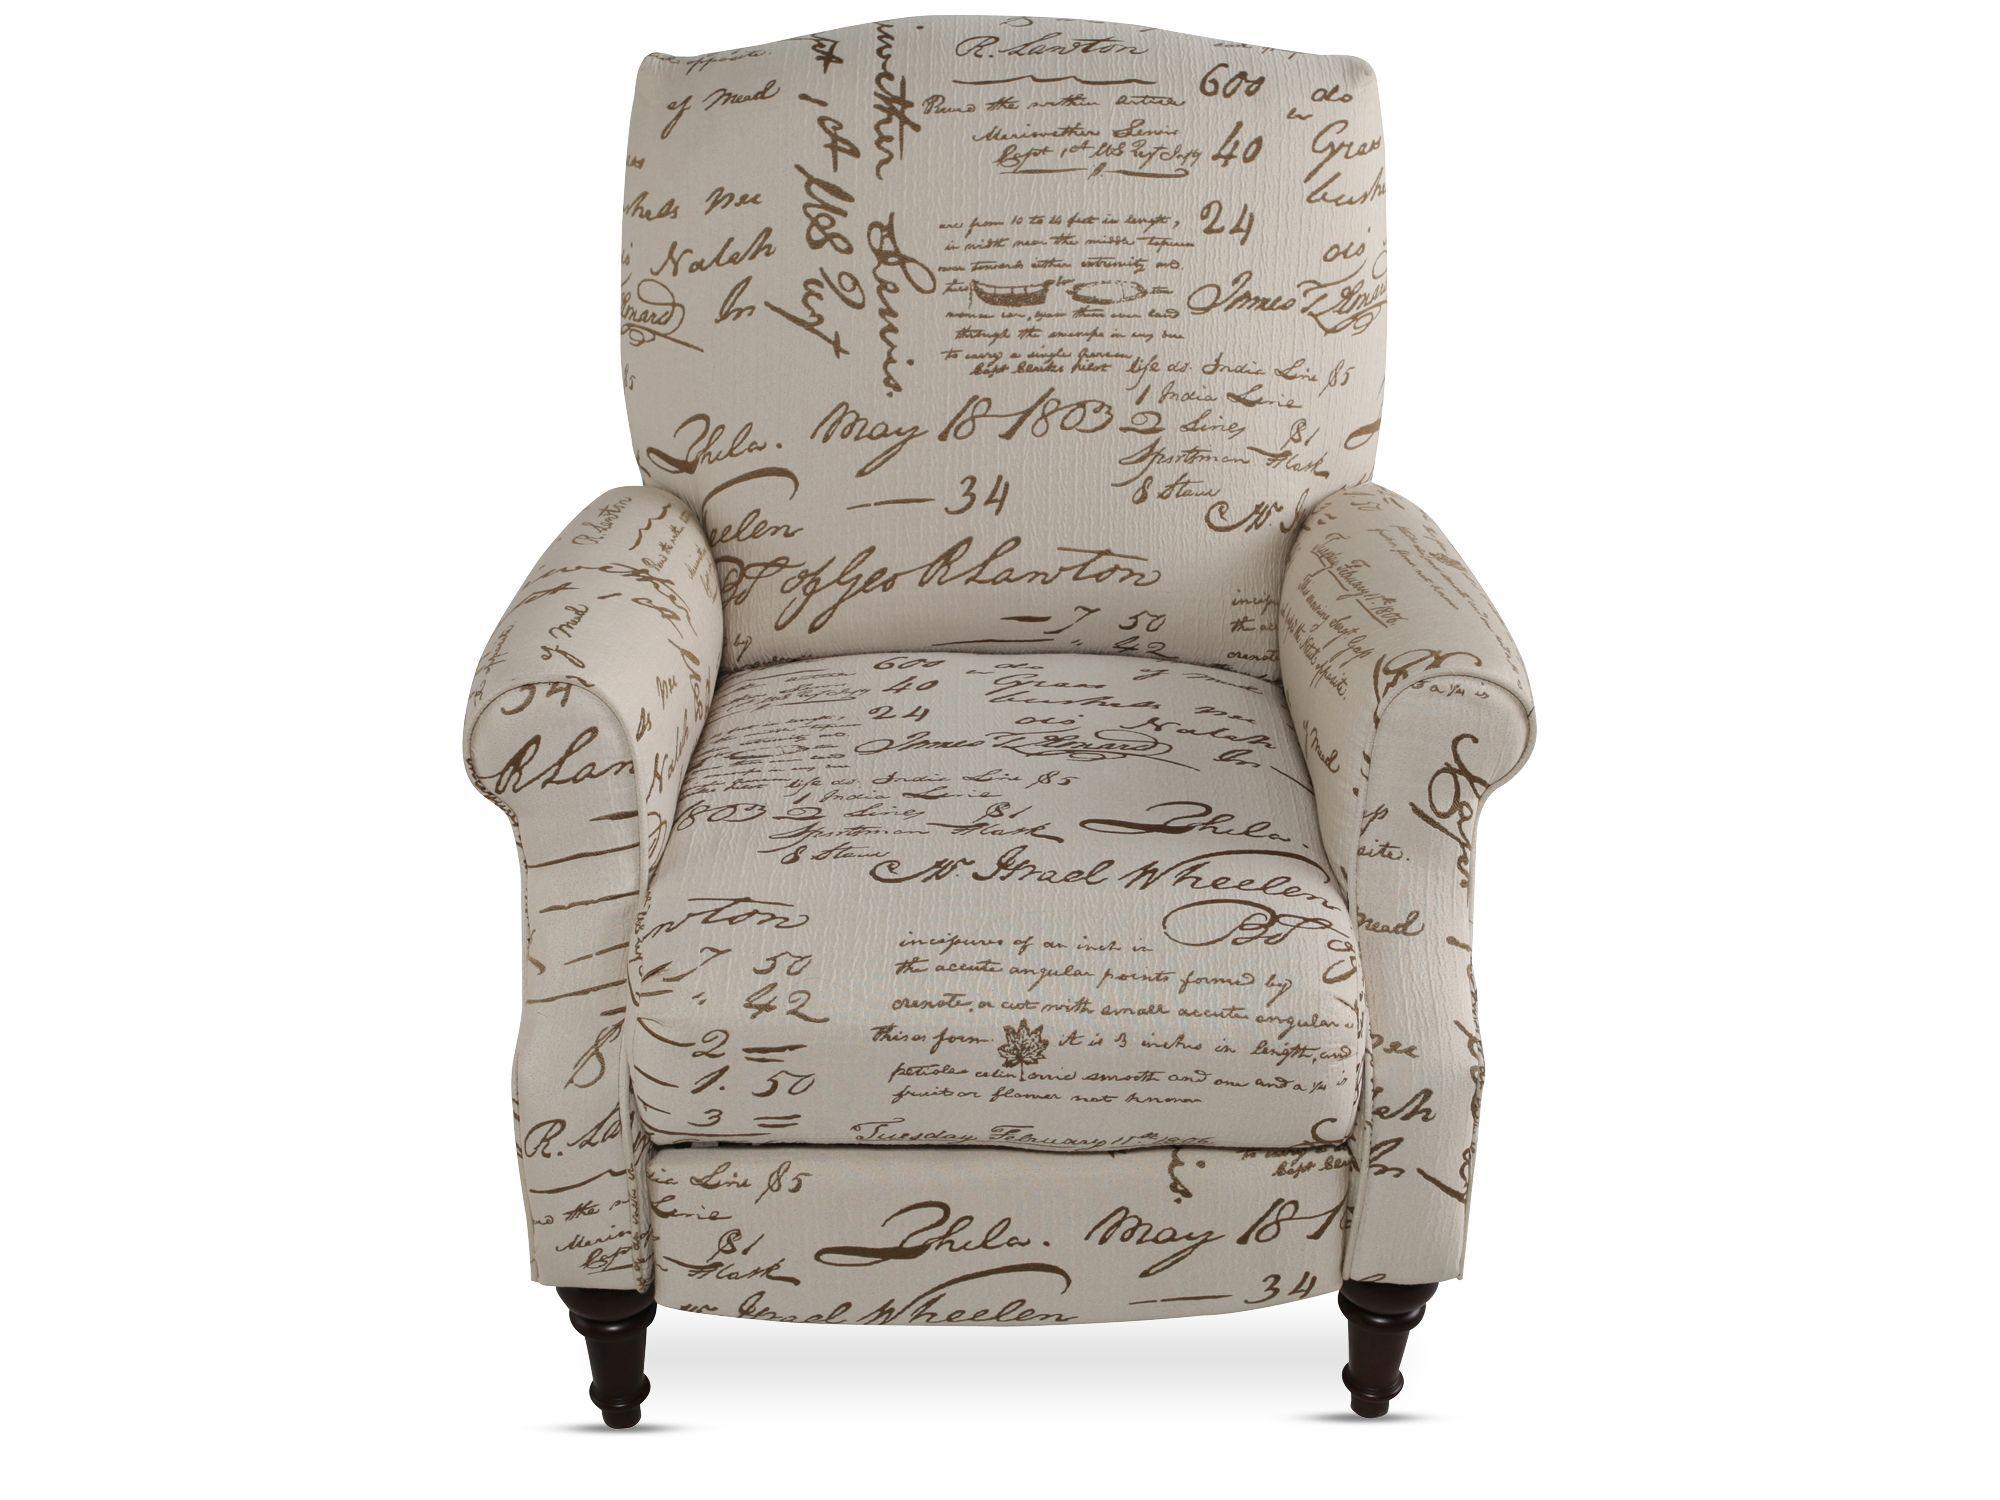 Lane Chloe High Leg Recliner ...  sc 1 st  Mathis Brothers & Lane Furniture | Mathis Brothers Furniture islam-shia.org